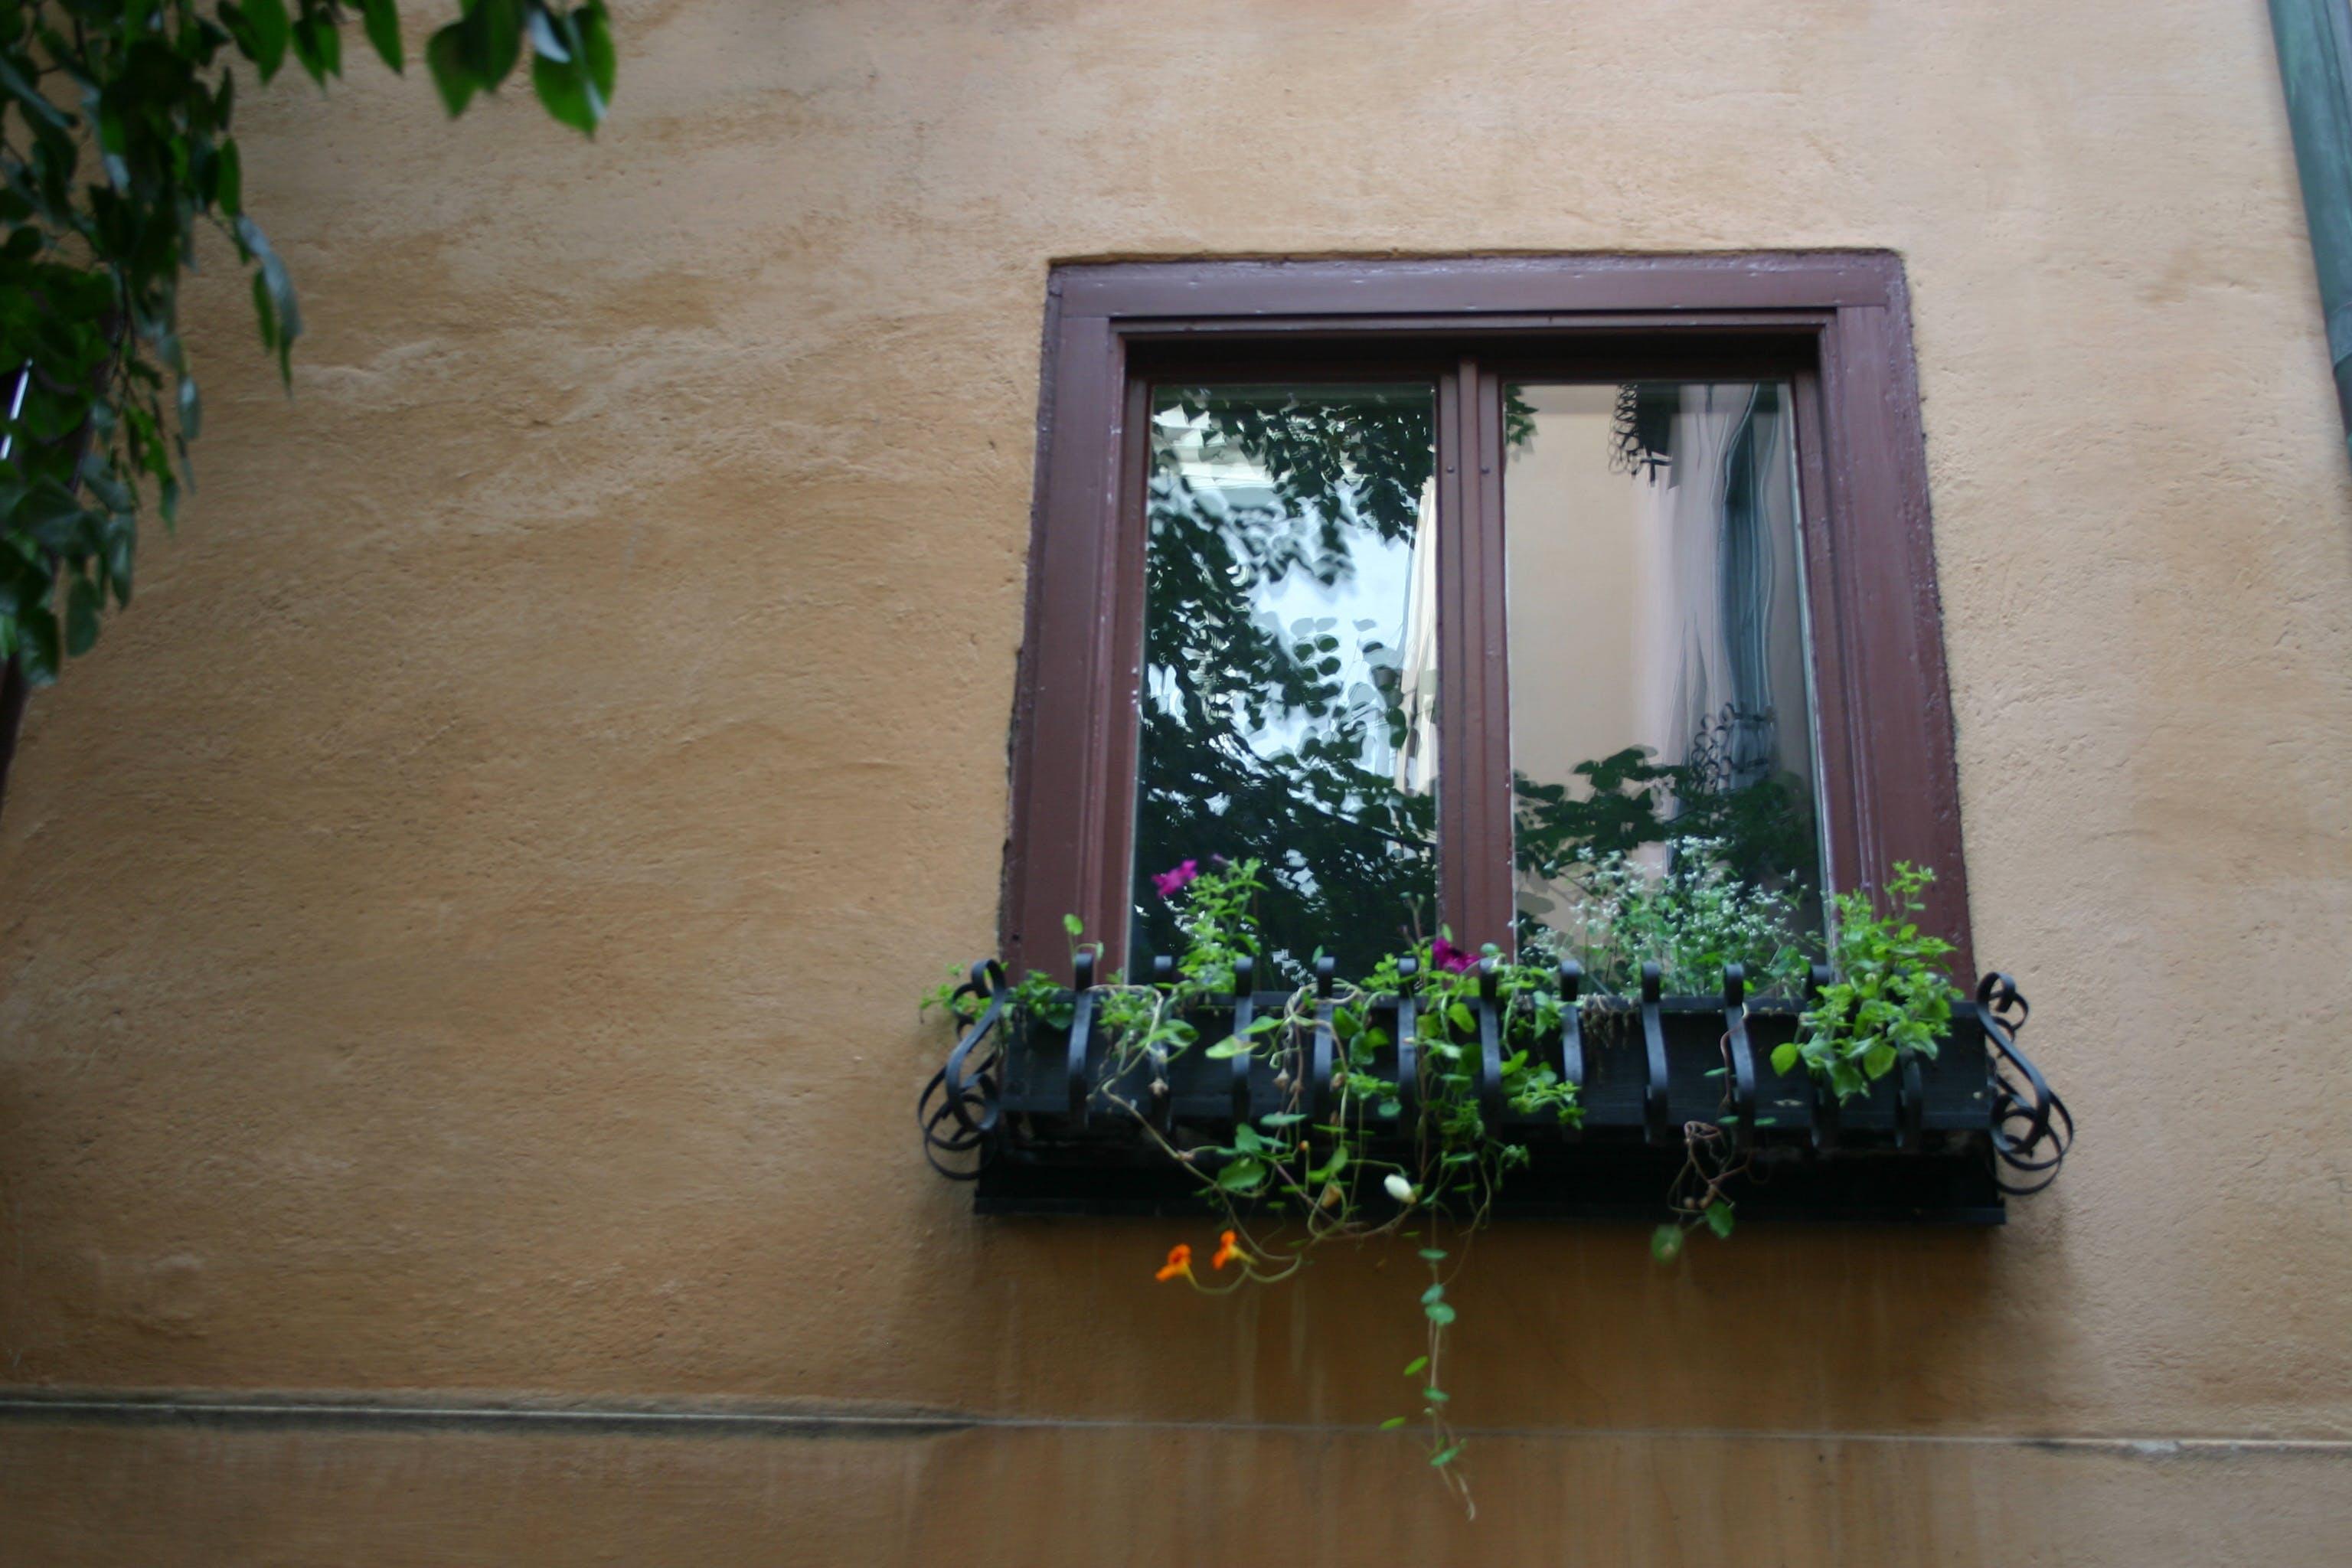 Fotos de stock gratuitas de arquitectura, diseño de interiores, edificio, flor